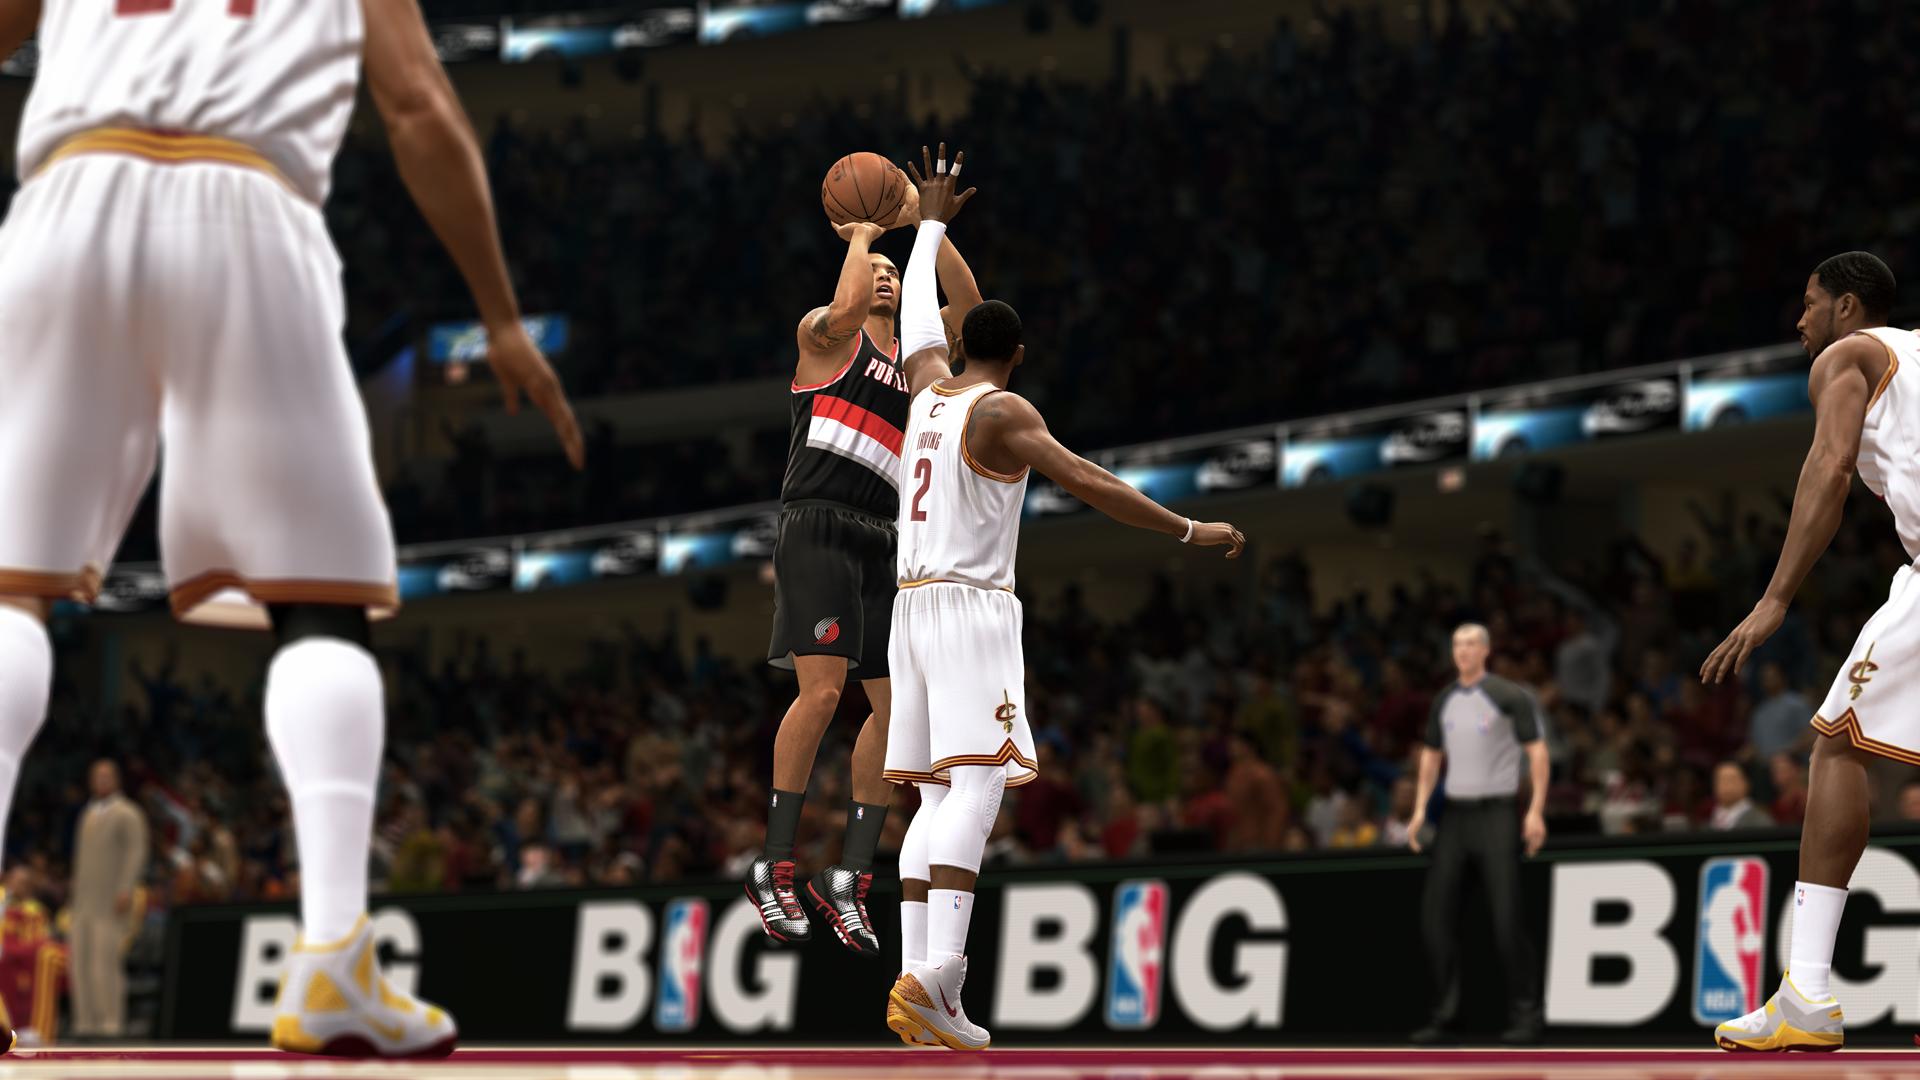 NBA Live 14 launching Nov. 19 on PS4, Xbox One